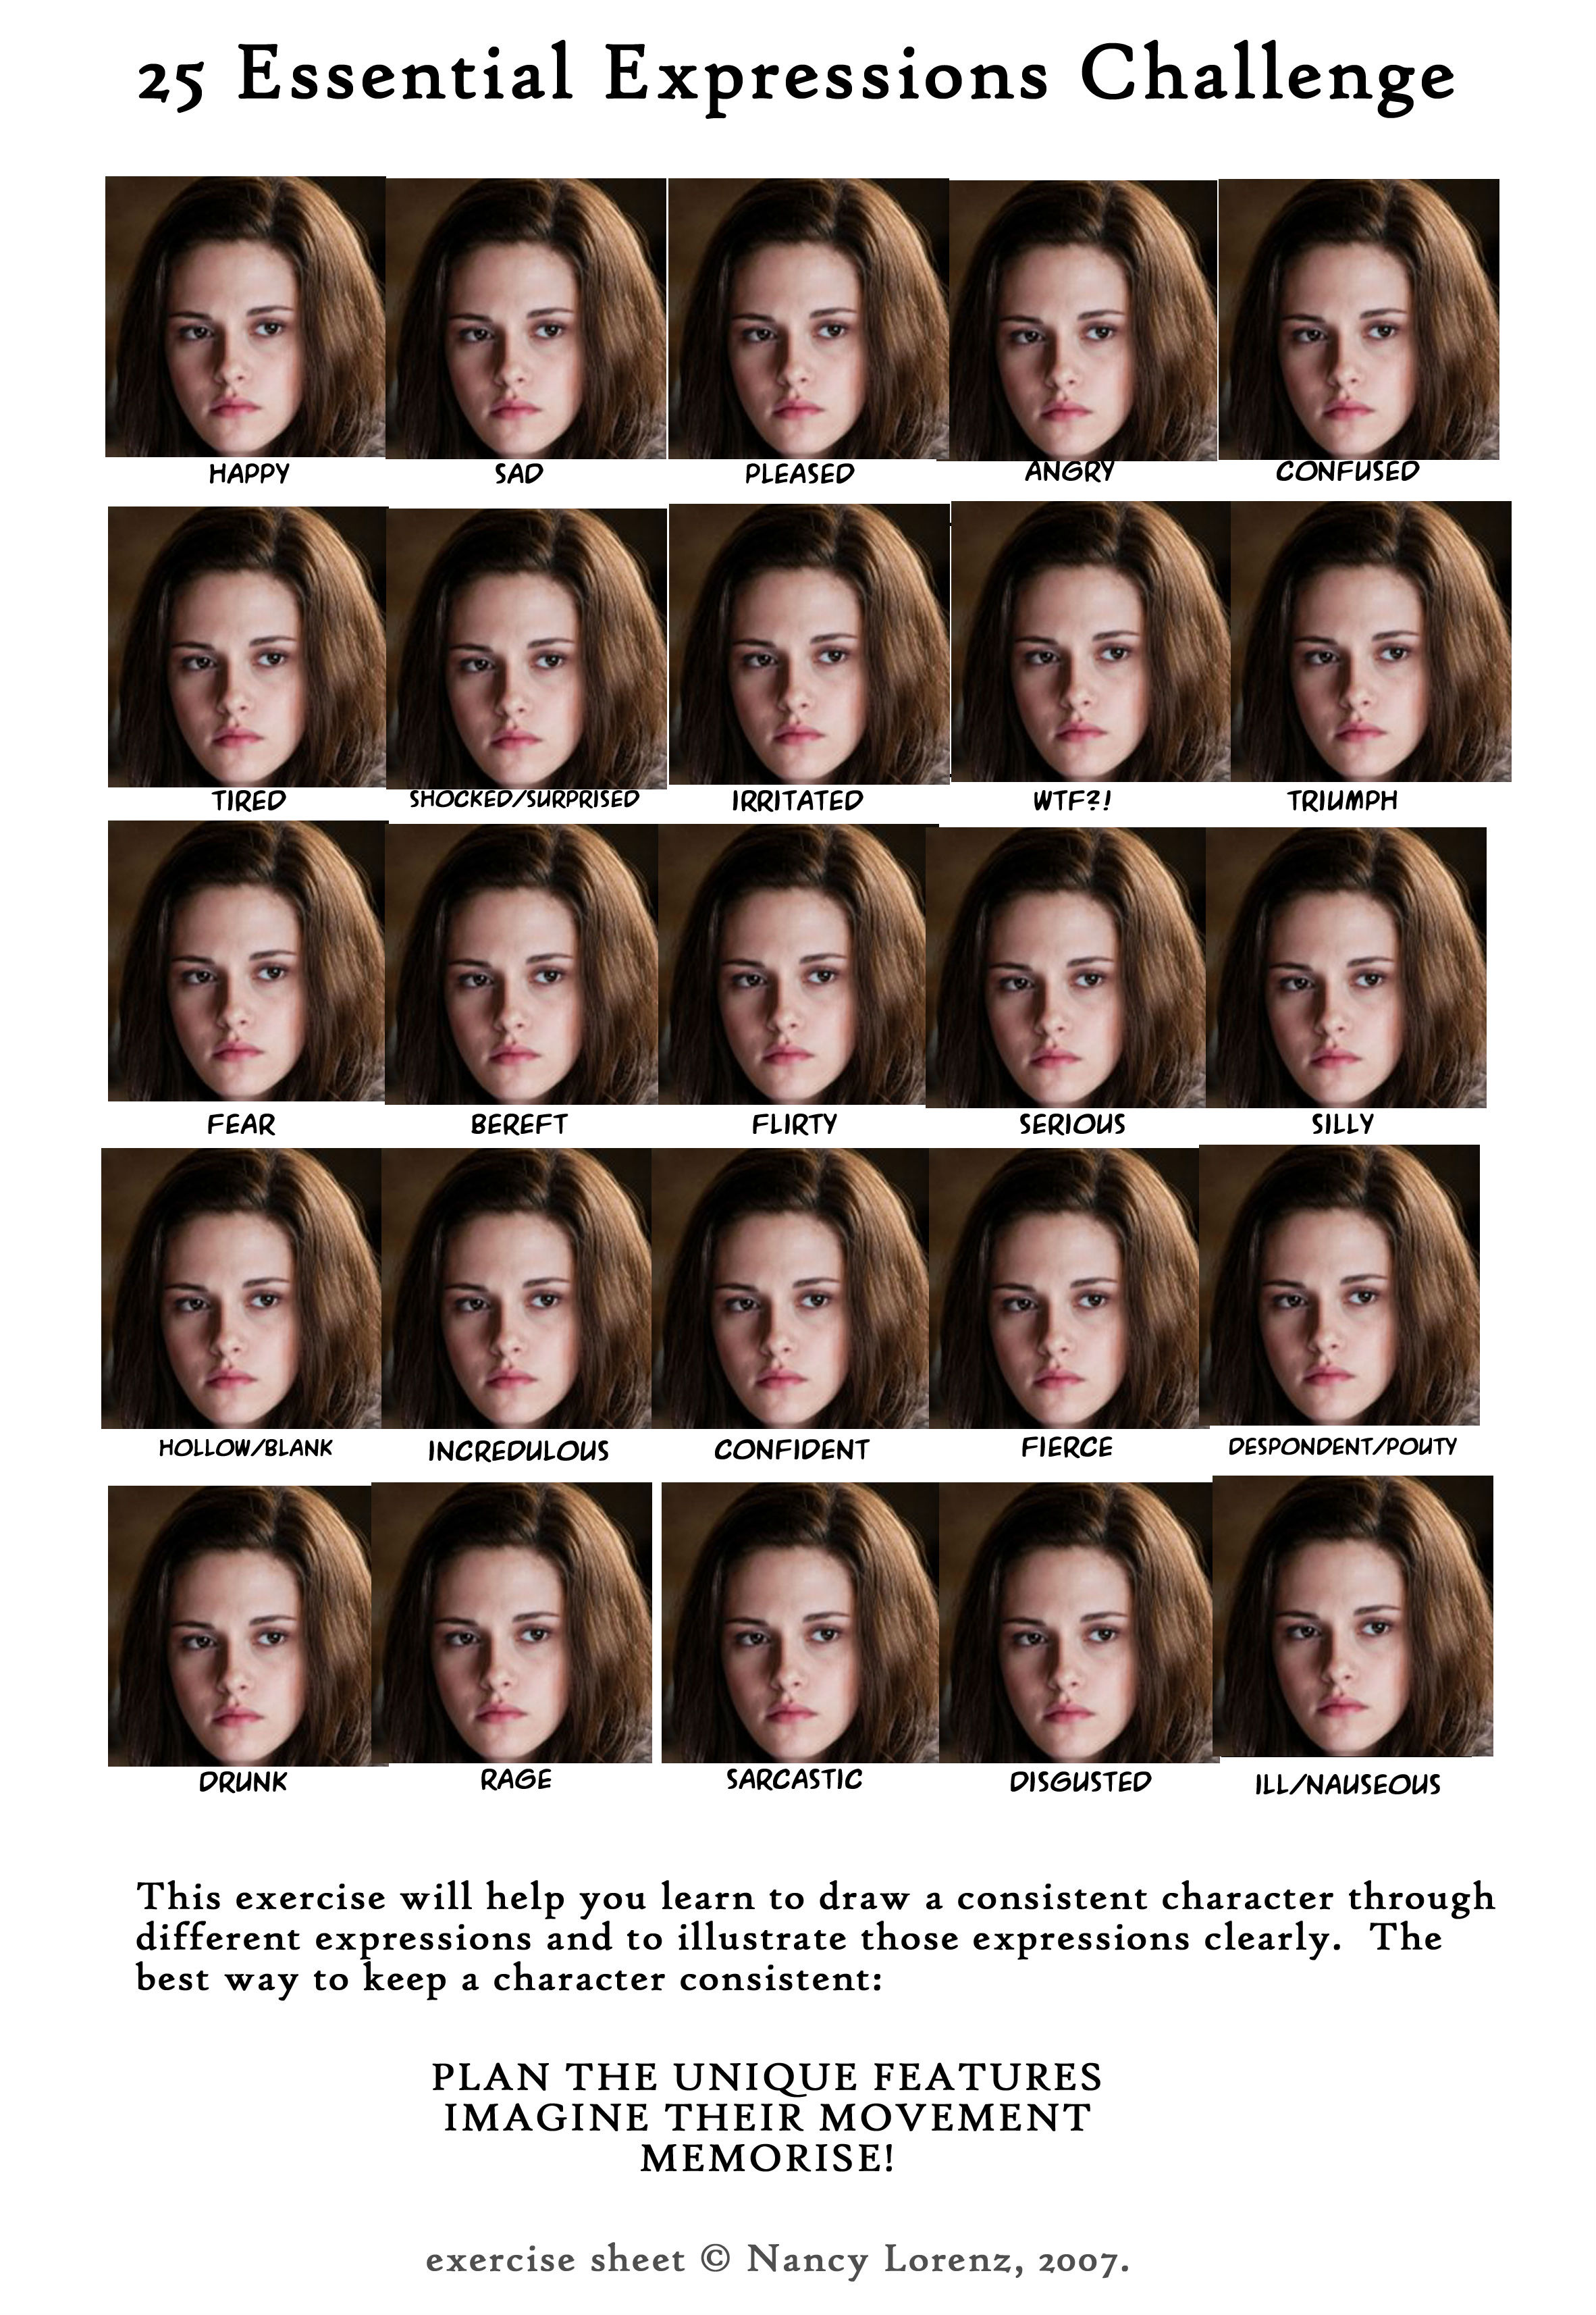 25_essential_expressions_meme_kristen_stewart_by_misshermionee-d4yqos8